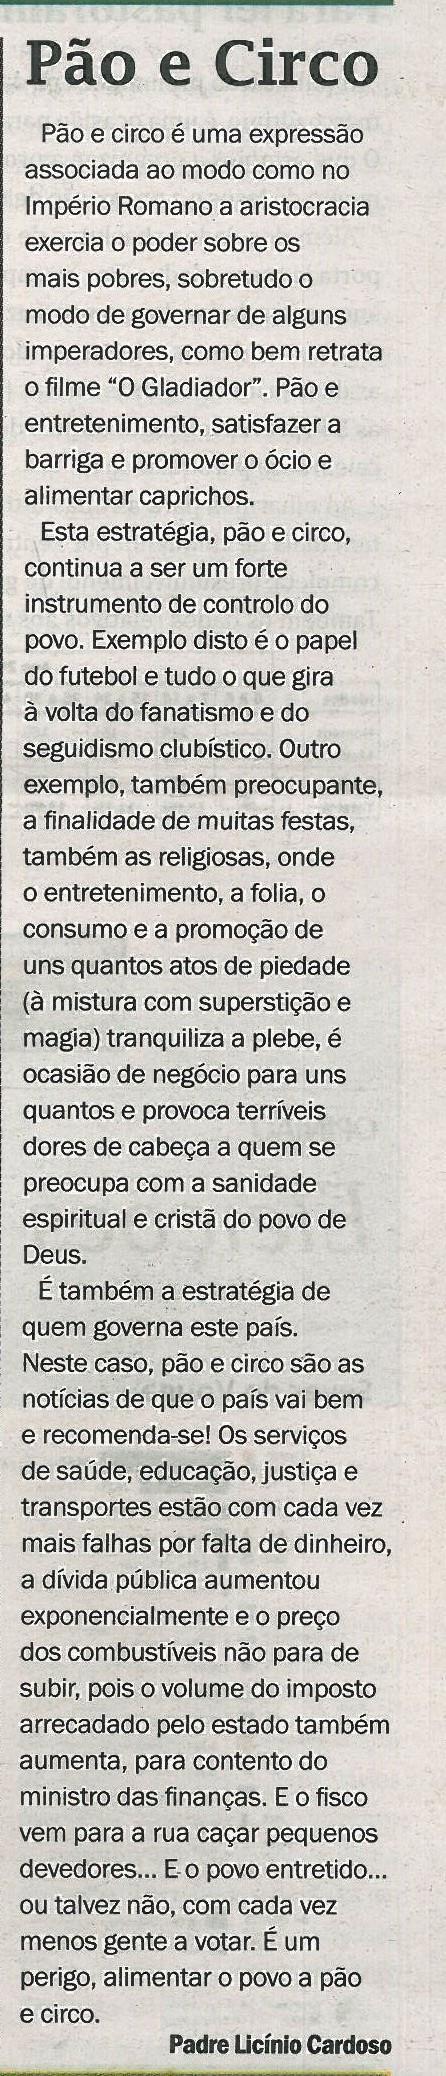 TV-jun.'19-p.1-Pão e circo.jpg